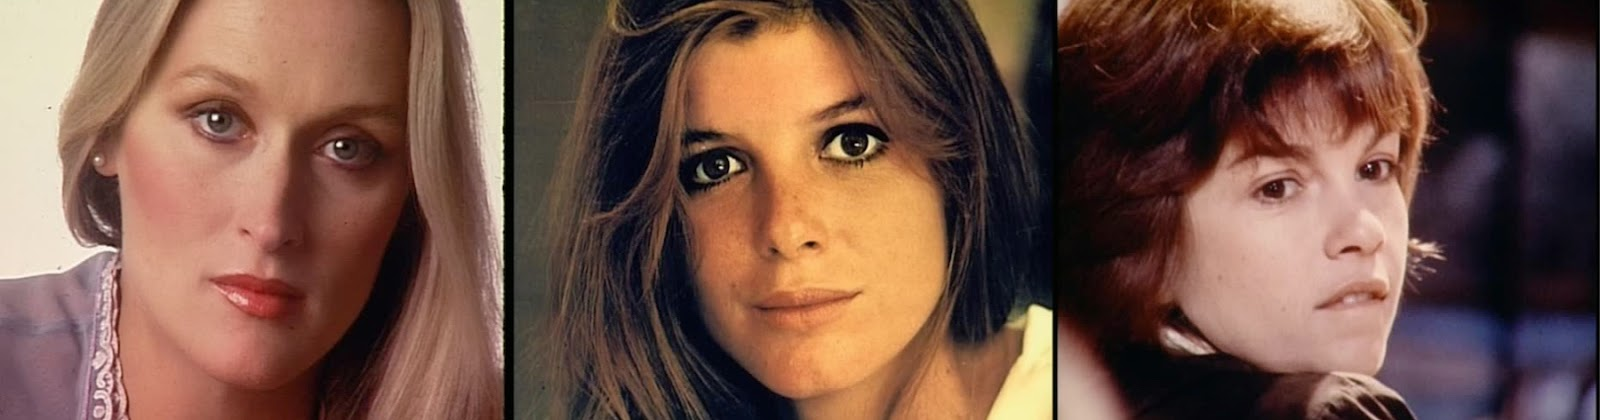 http://alienexplorations.blogspot.co.uk/1978/03/alien-list-of-actresses.html